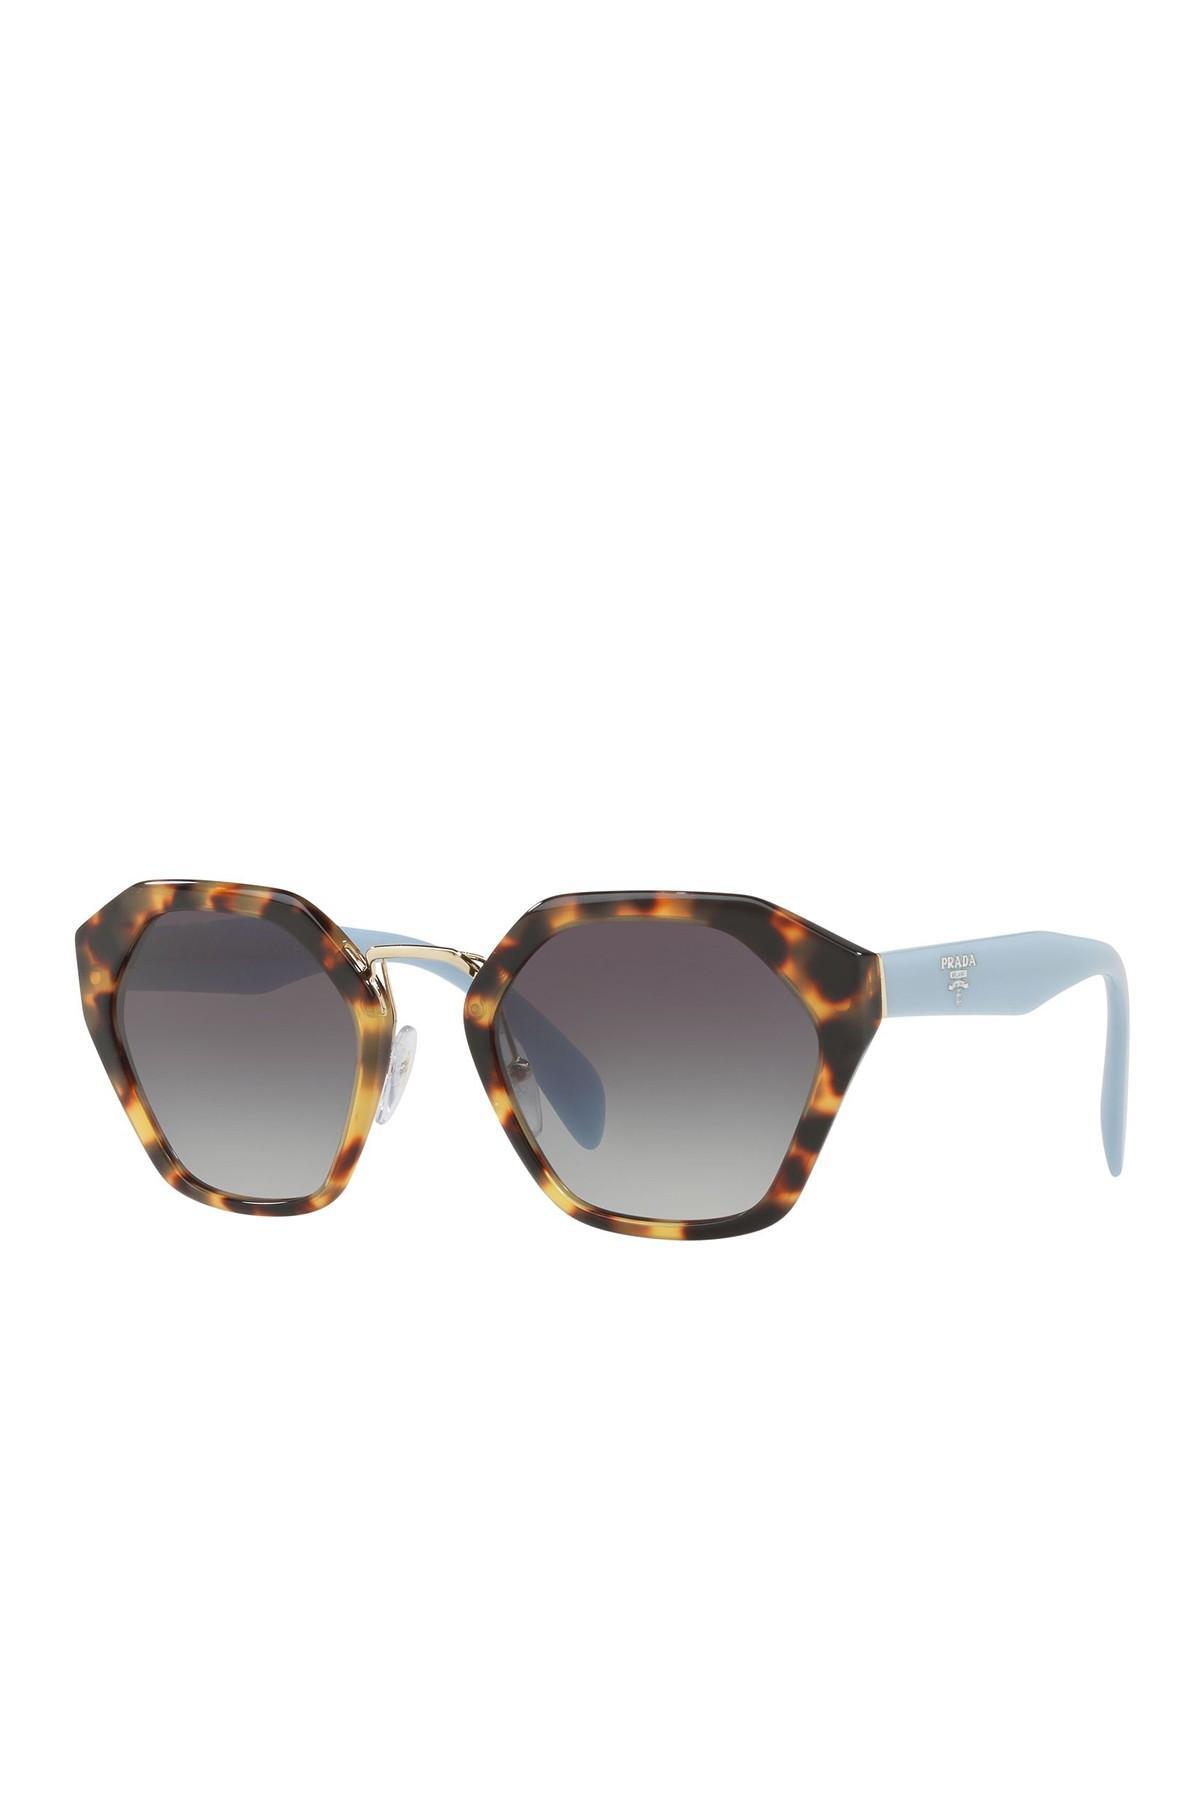 9e576d8dafd8 Prada 55mm Irregular Cat Eye Sunglasses - Lyst